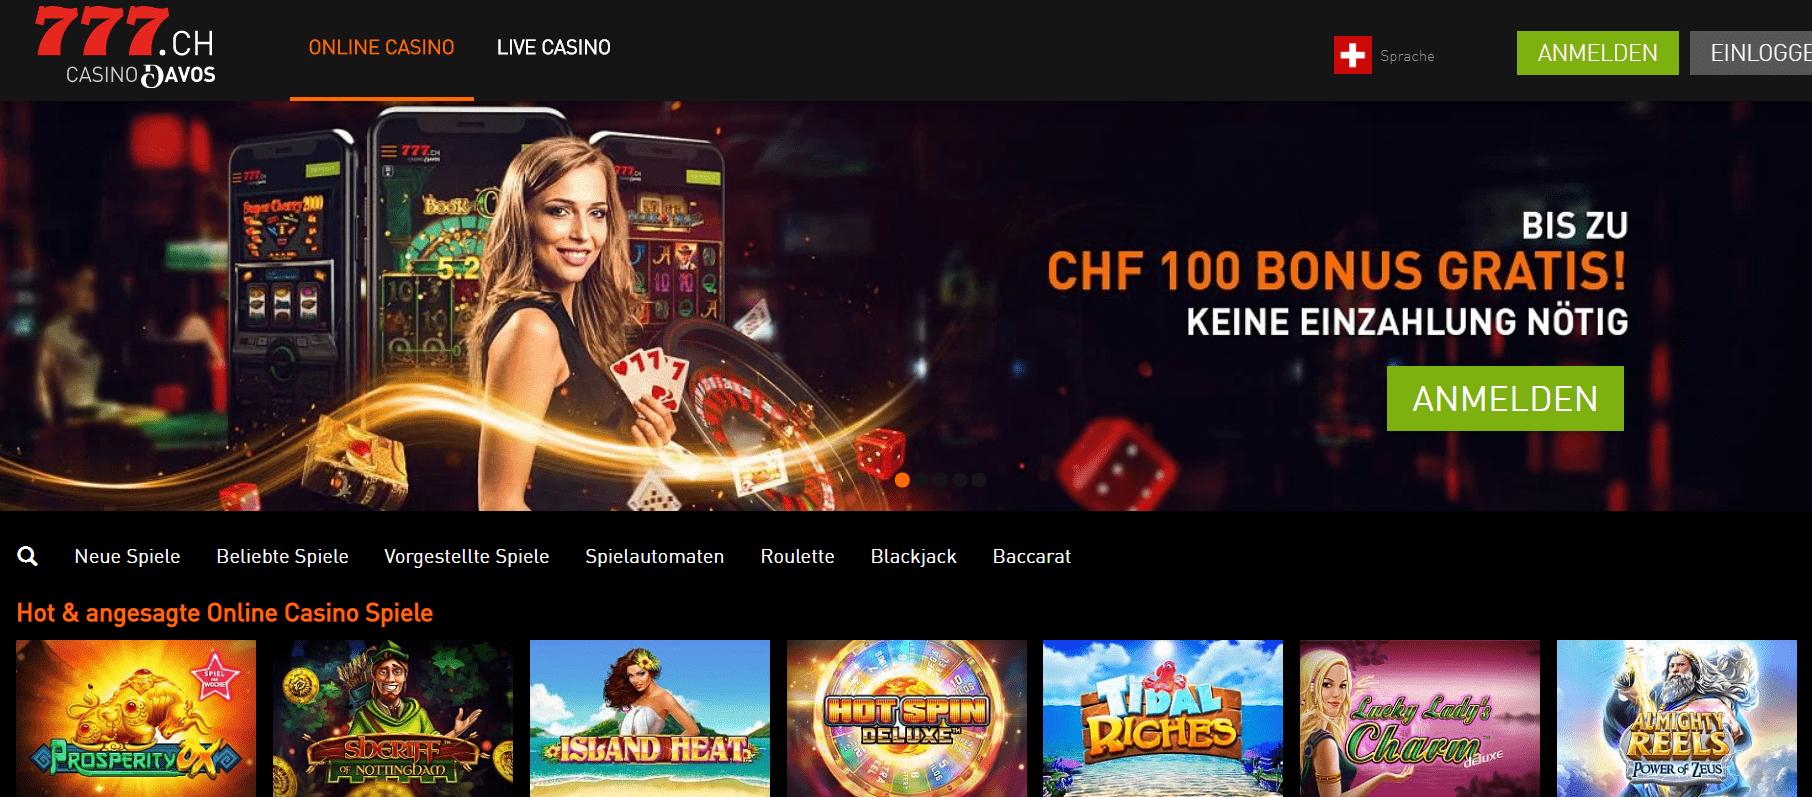 Casino777 ch siete